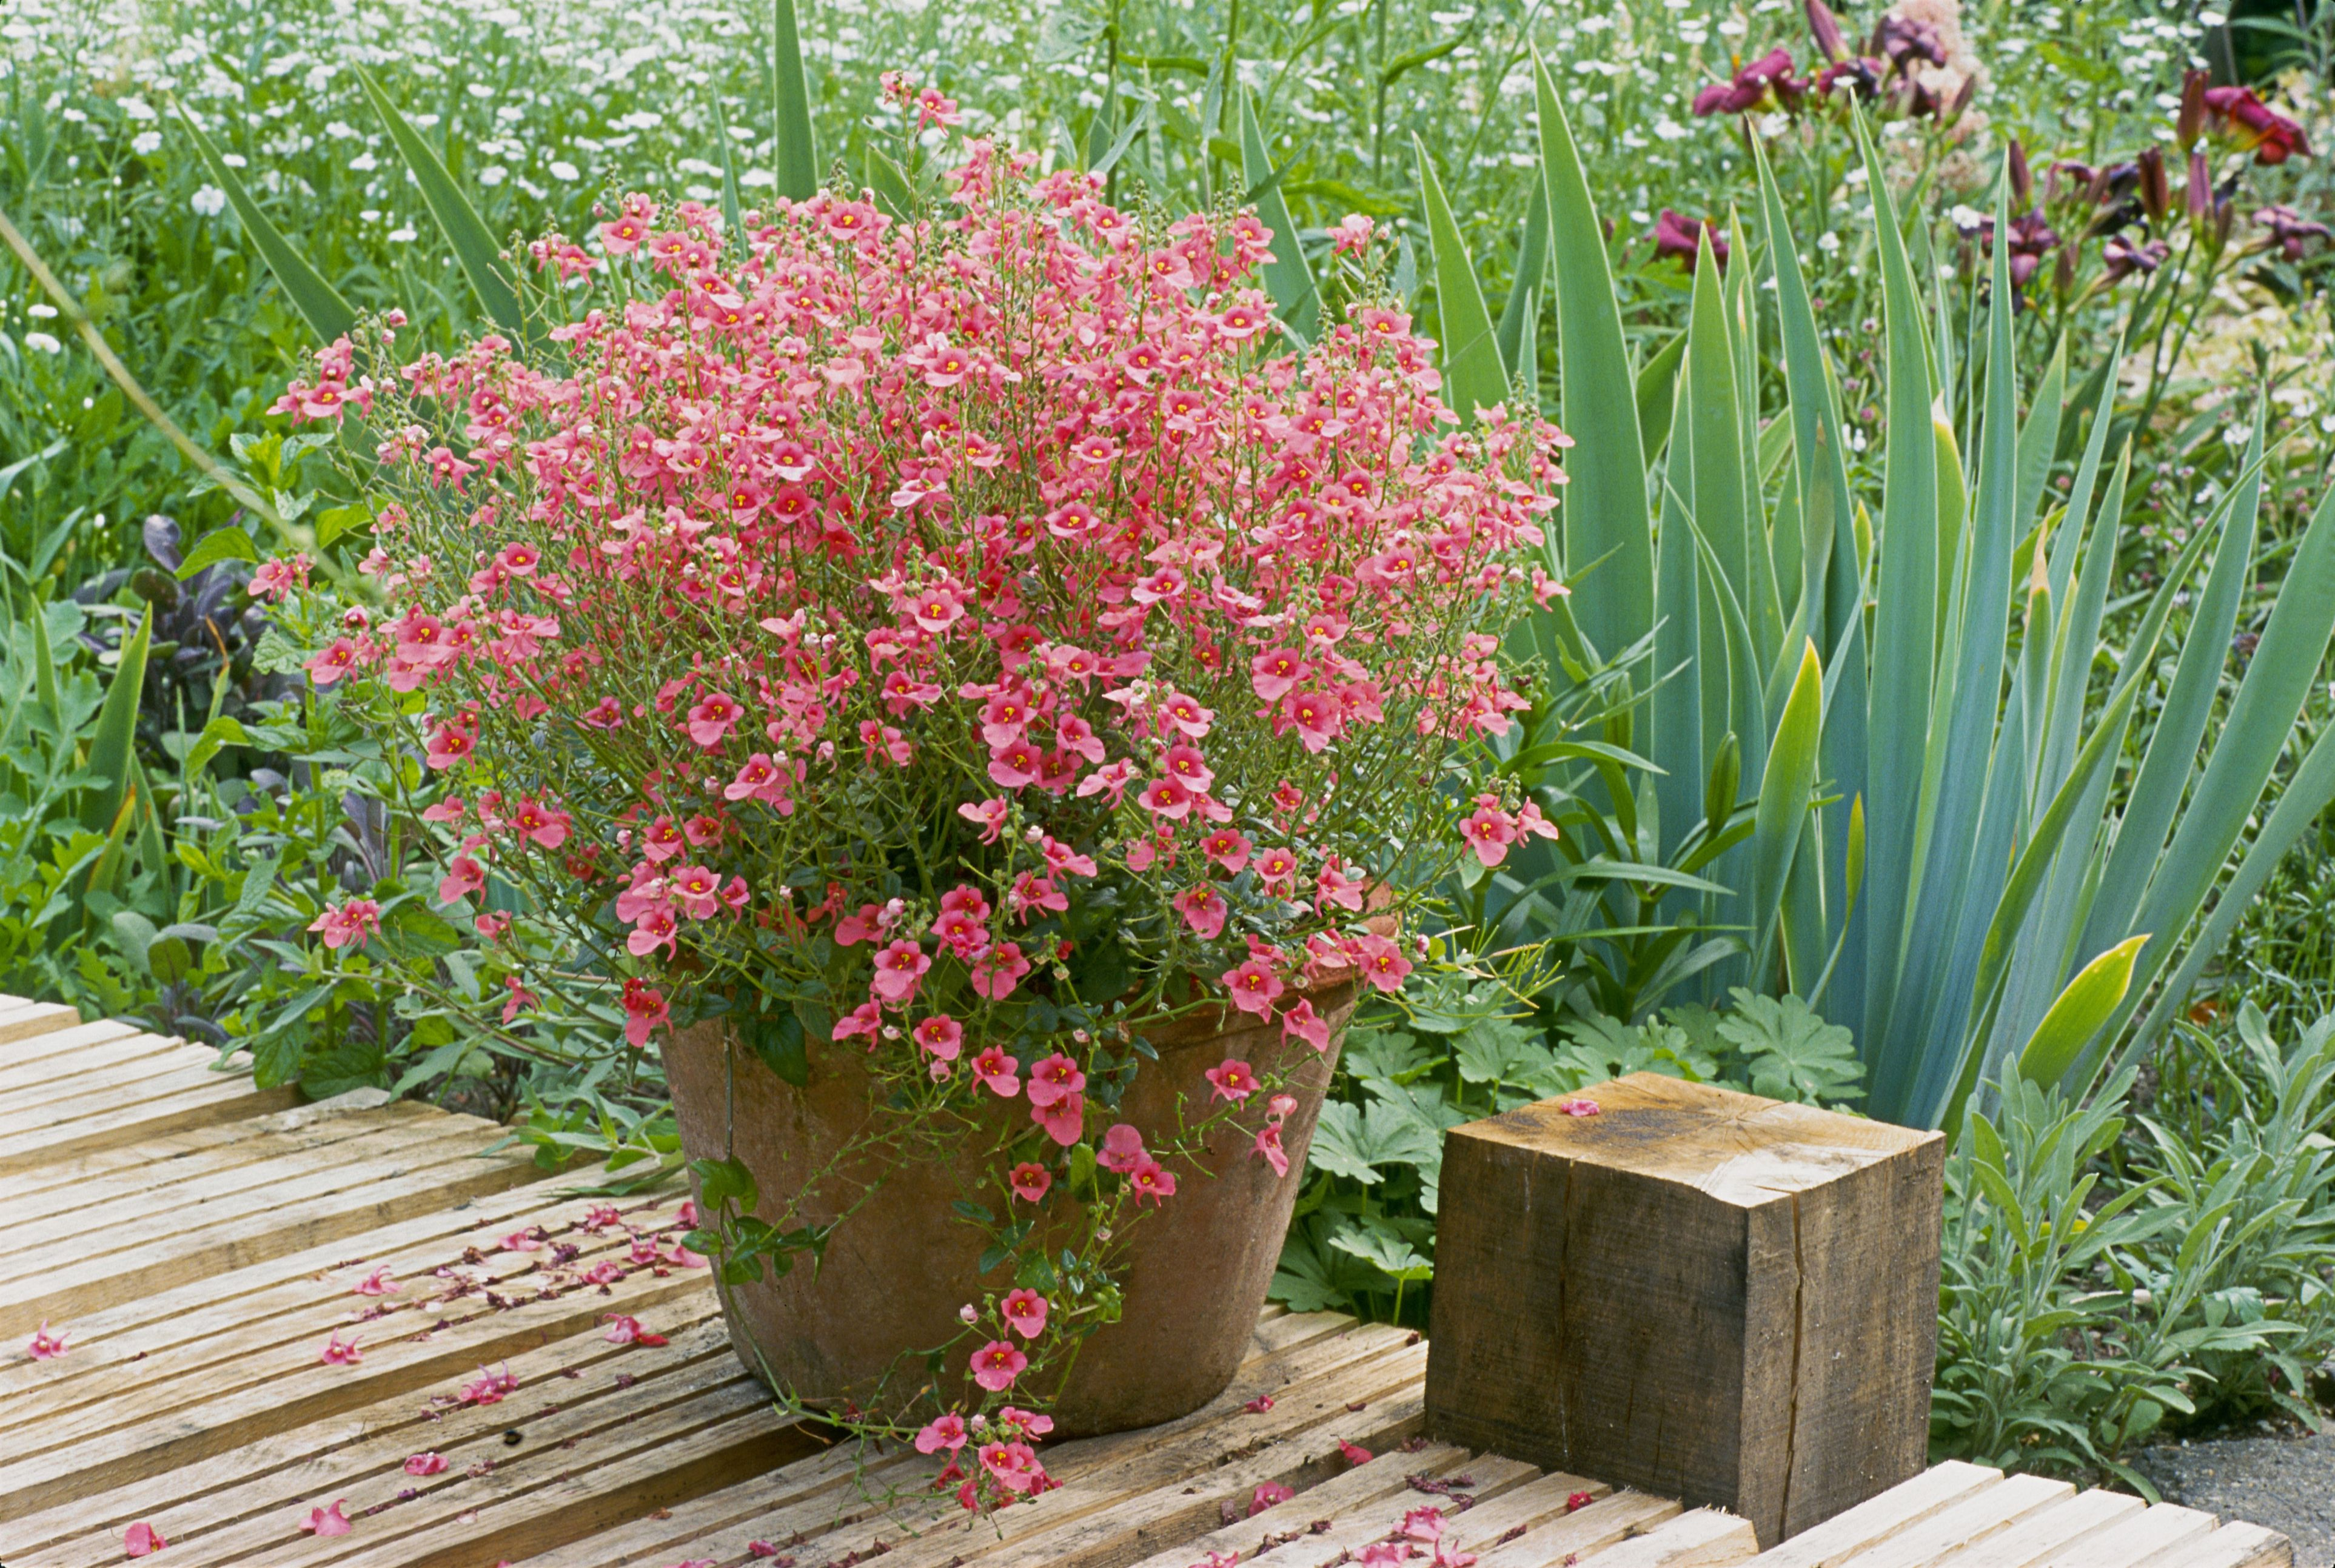 Cool season annual flowers for spring and fall diascia izmirmasajfo